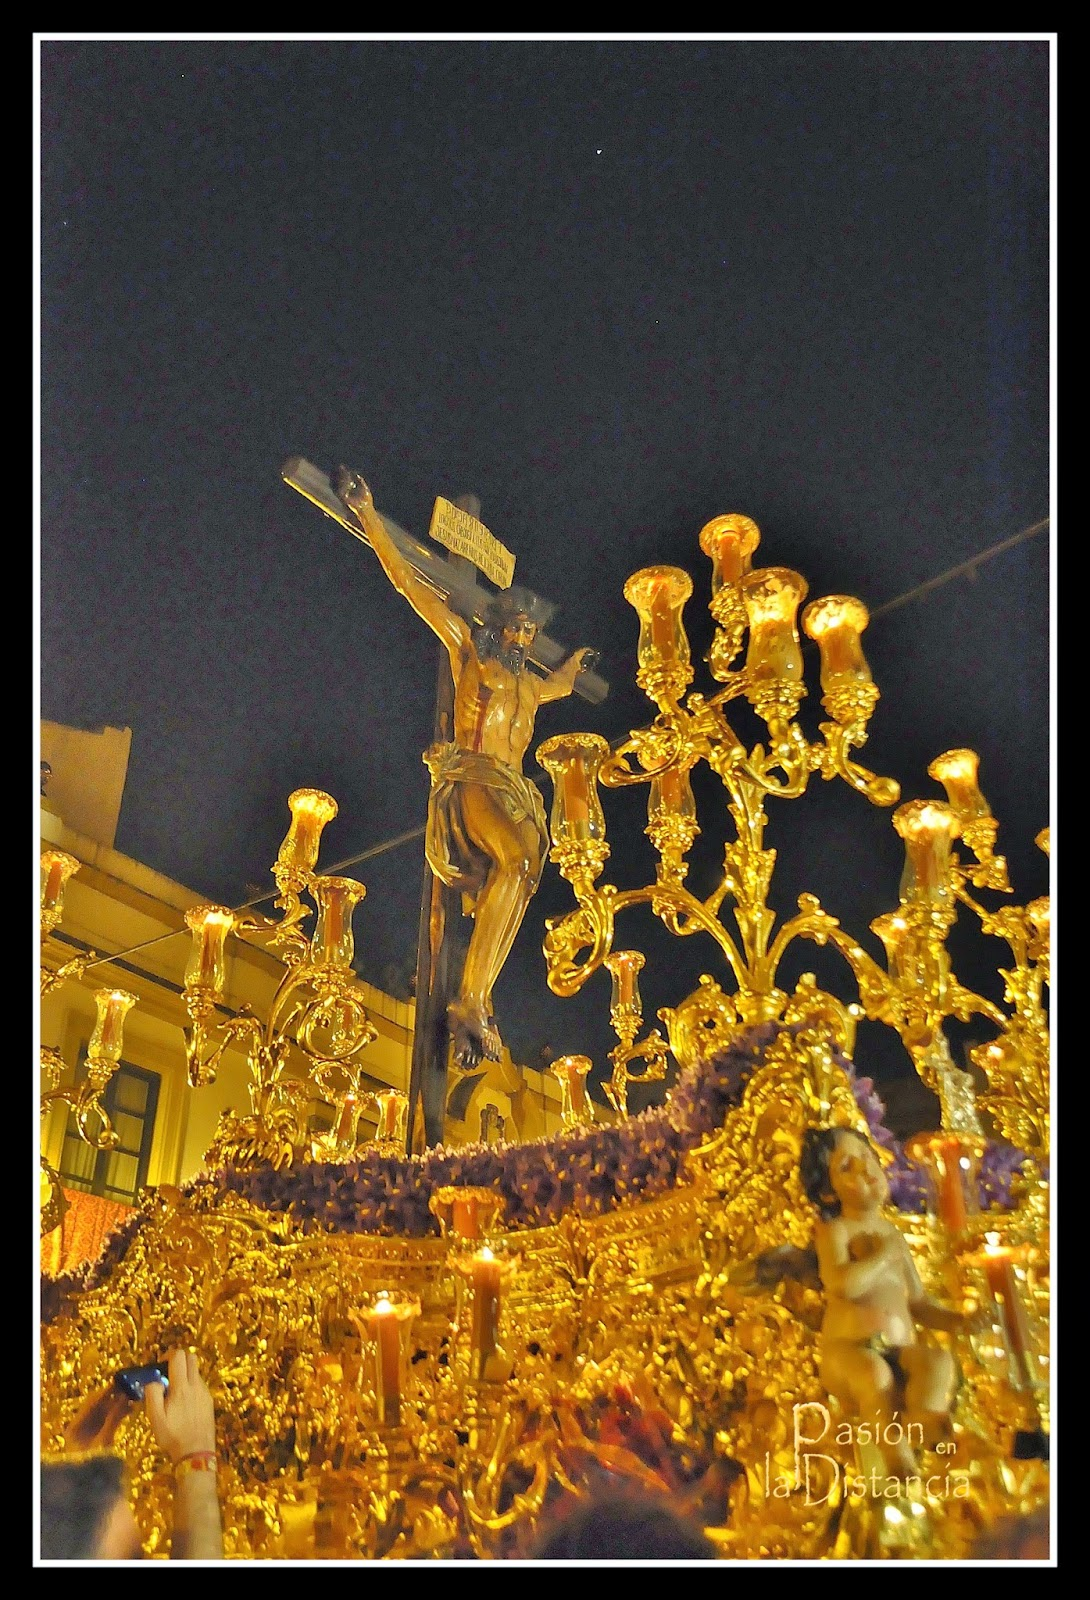 Cristo de las Almas Semana Santa 2014 Los Javieres